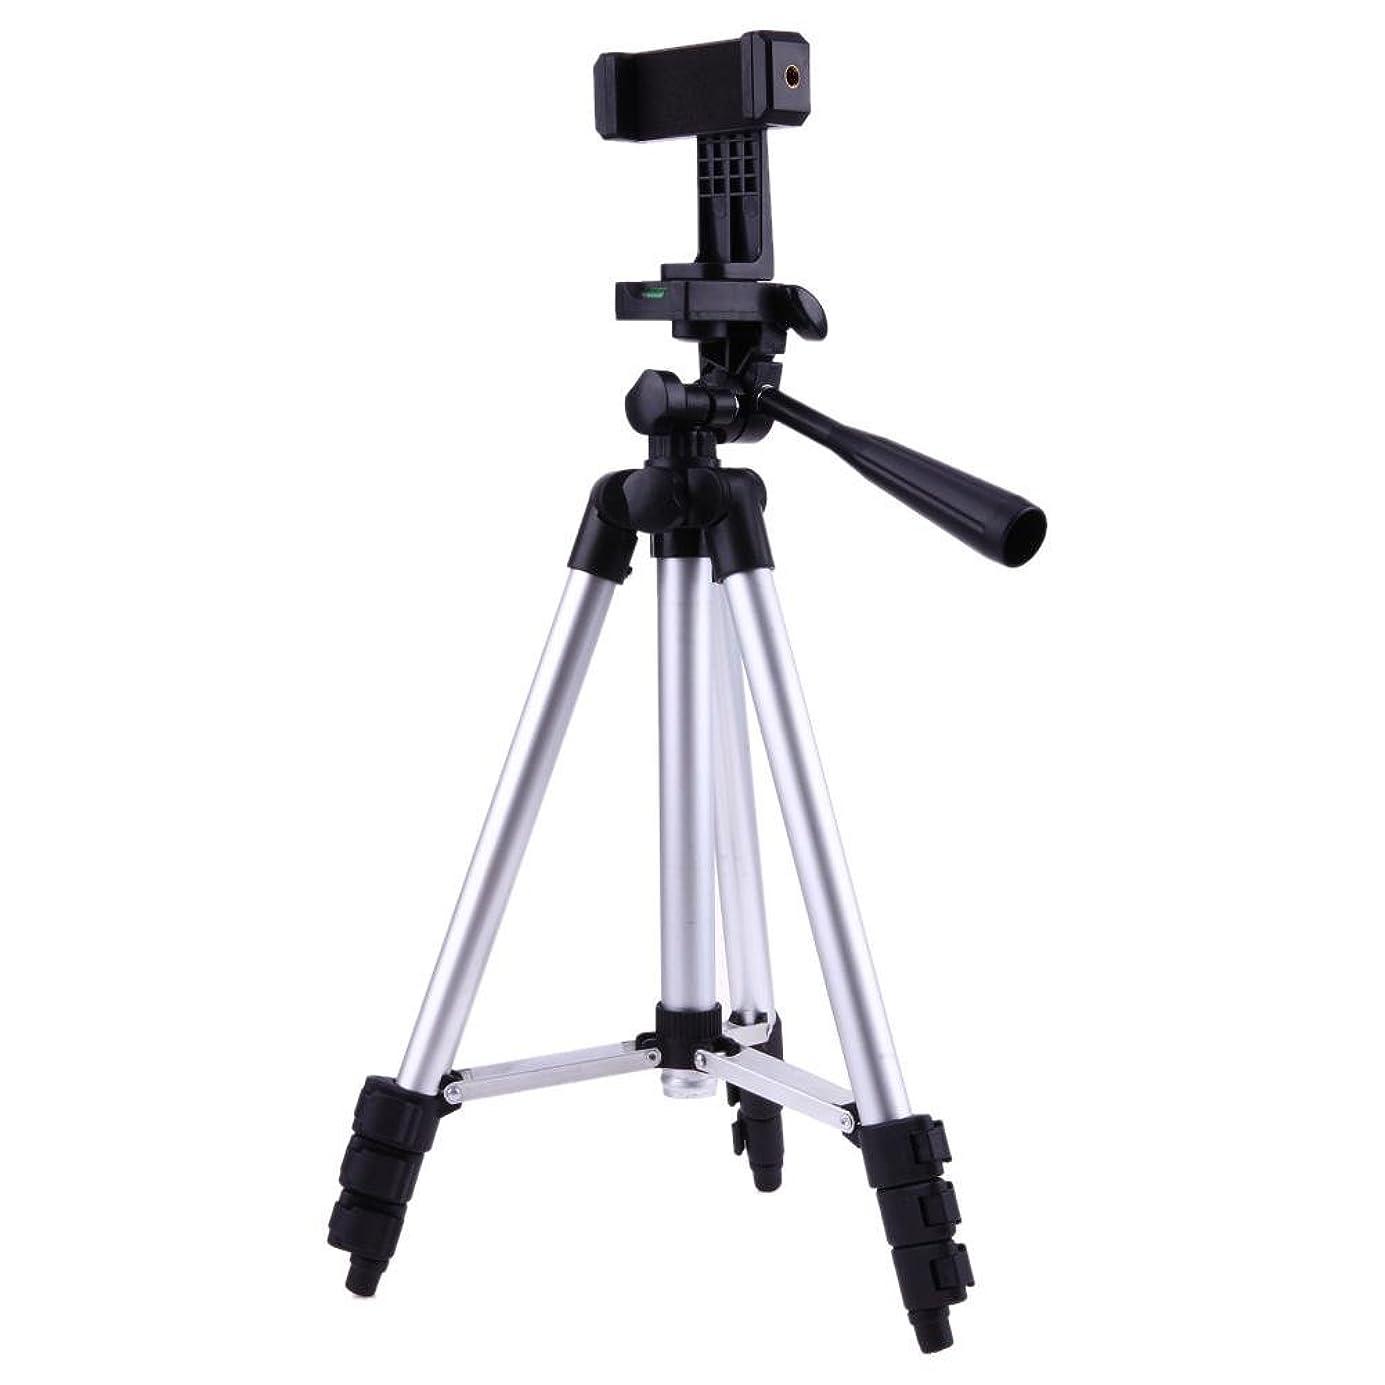 Youtiankai Tripod Professional Camera Tripod Stand Holder for Smart Phone iPhone Samsung xiysry8191